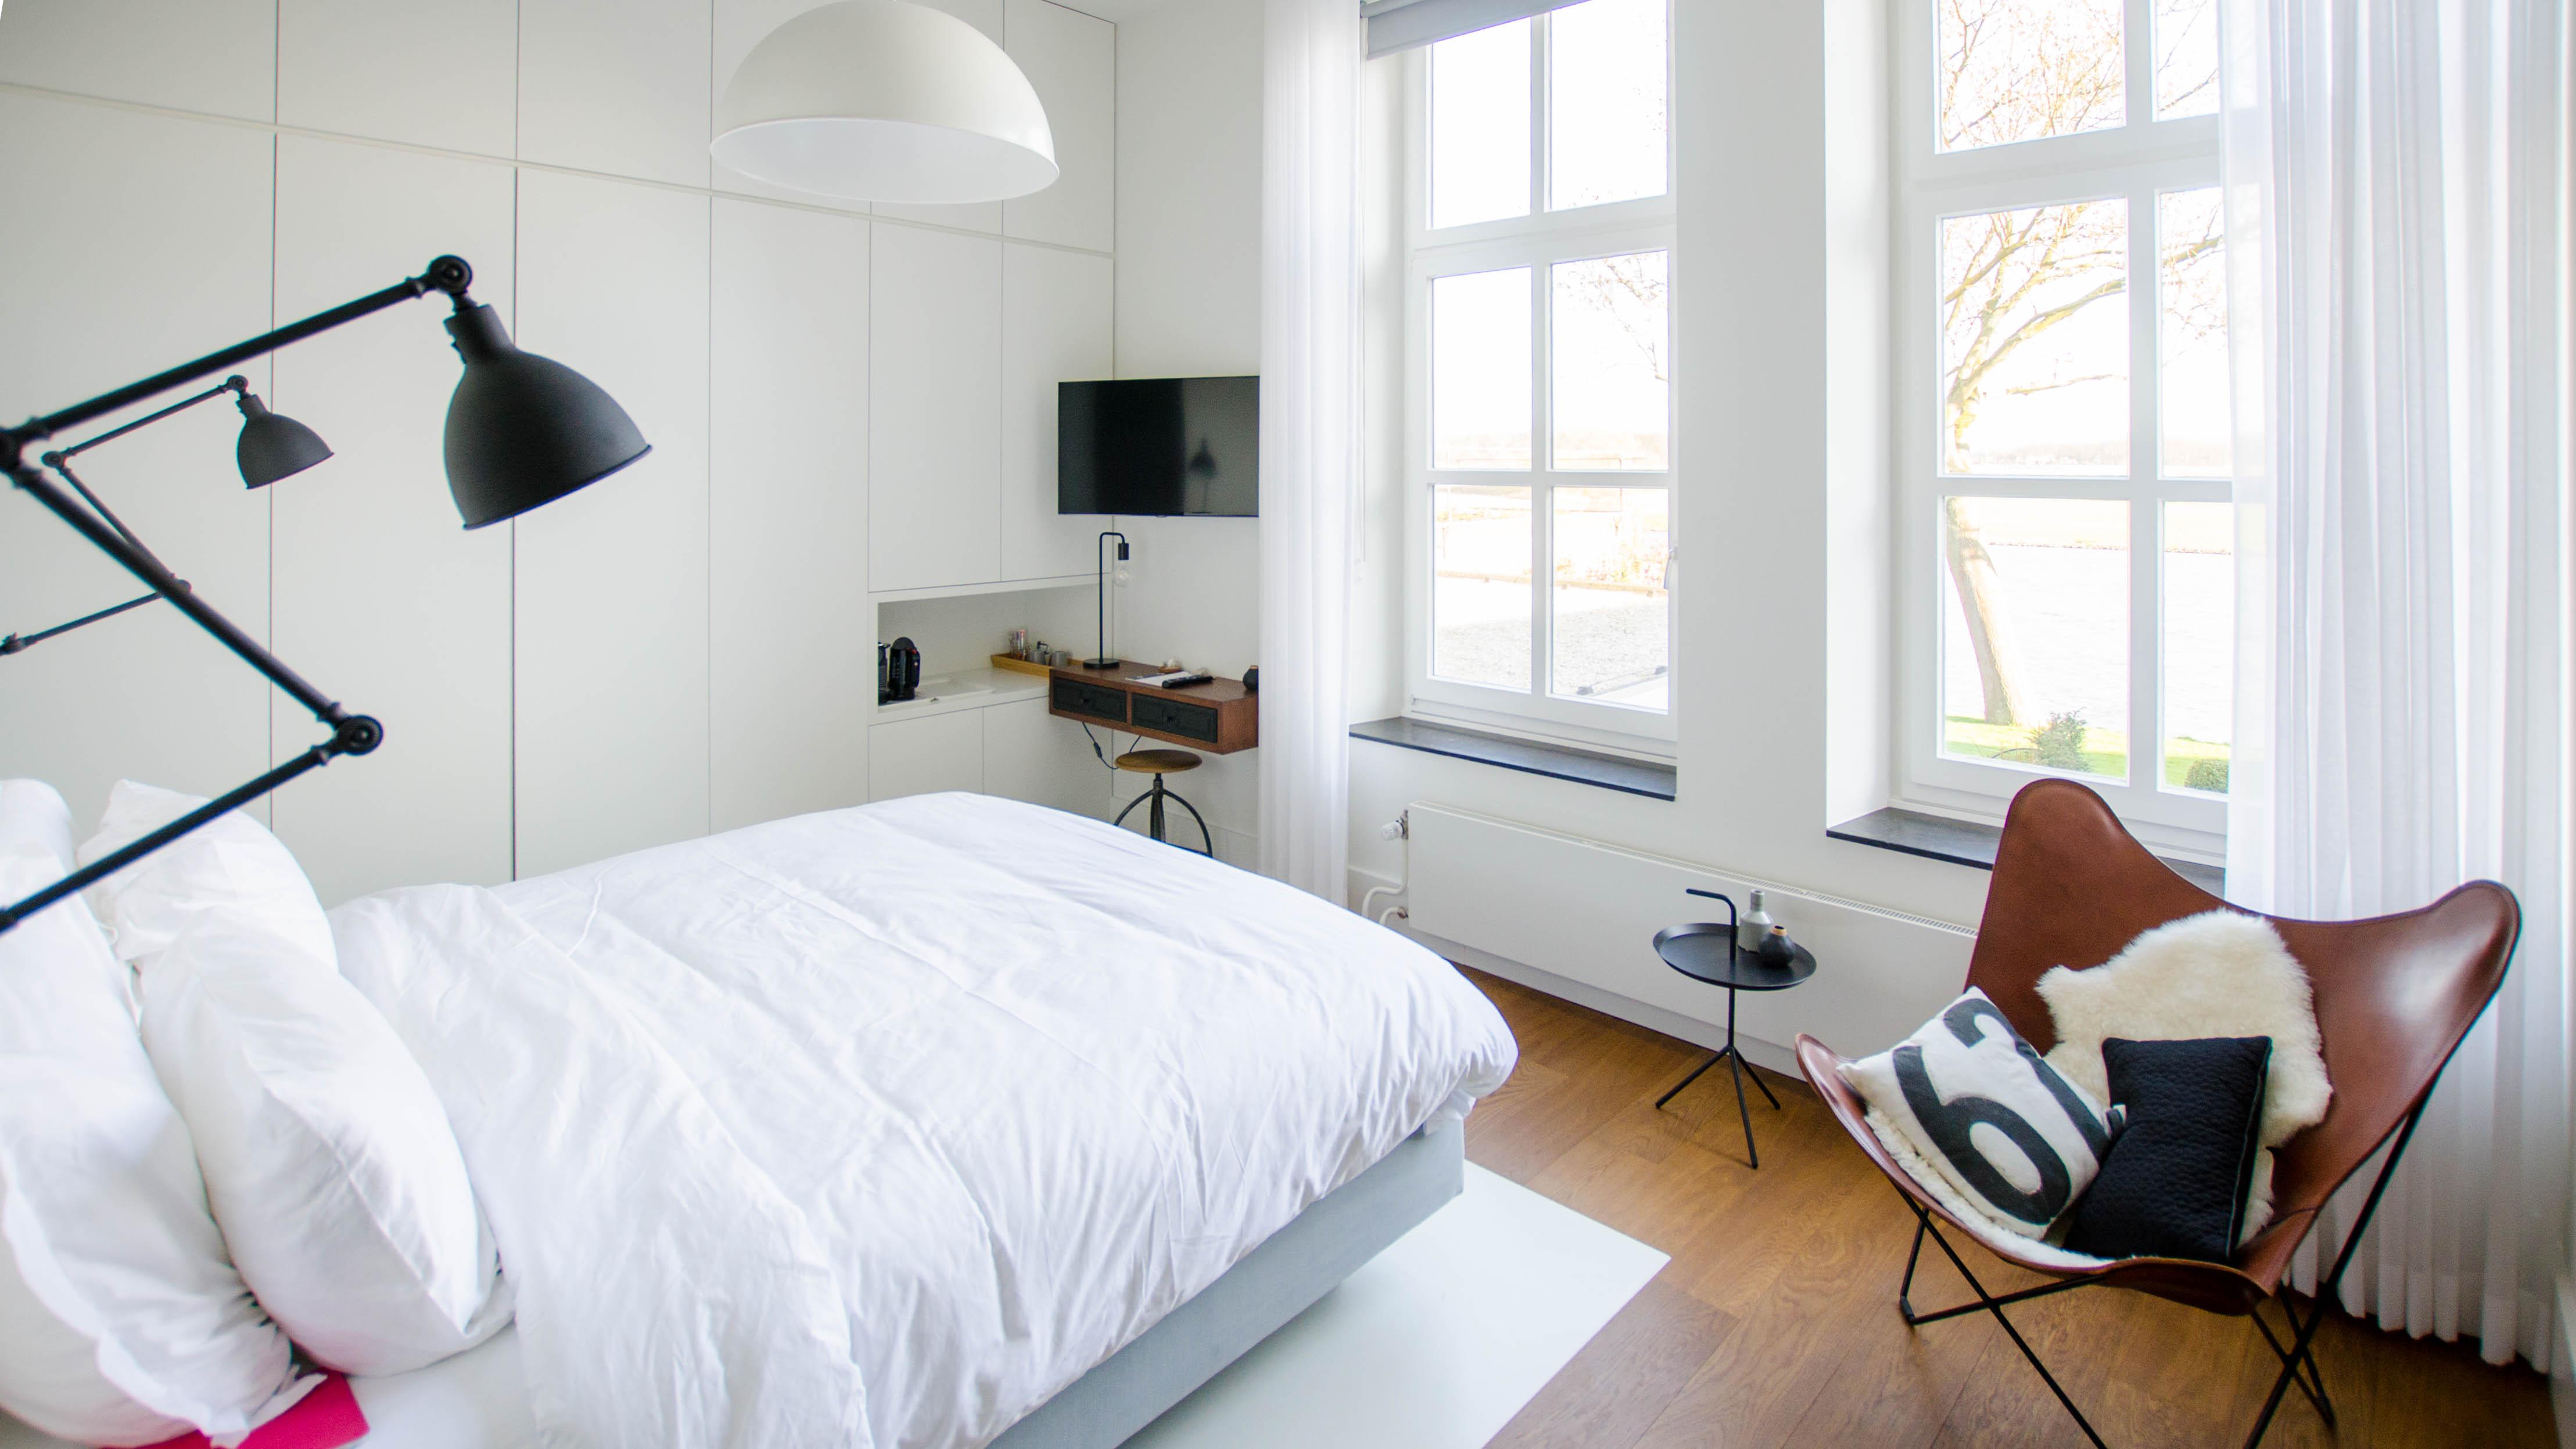 Fernwehyvi – Der Reiseblog | Das Design B&B Het Raadhuys in Kessel